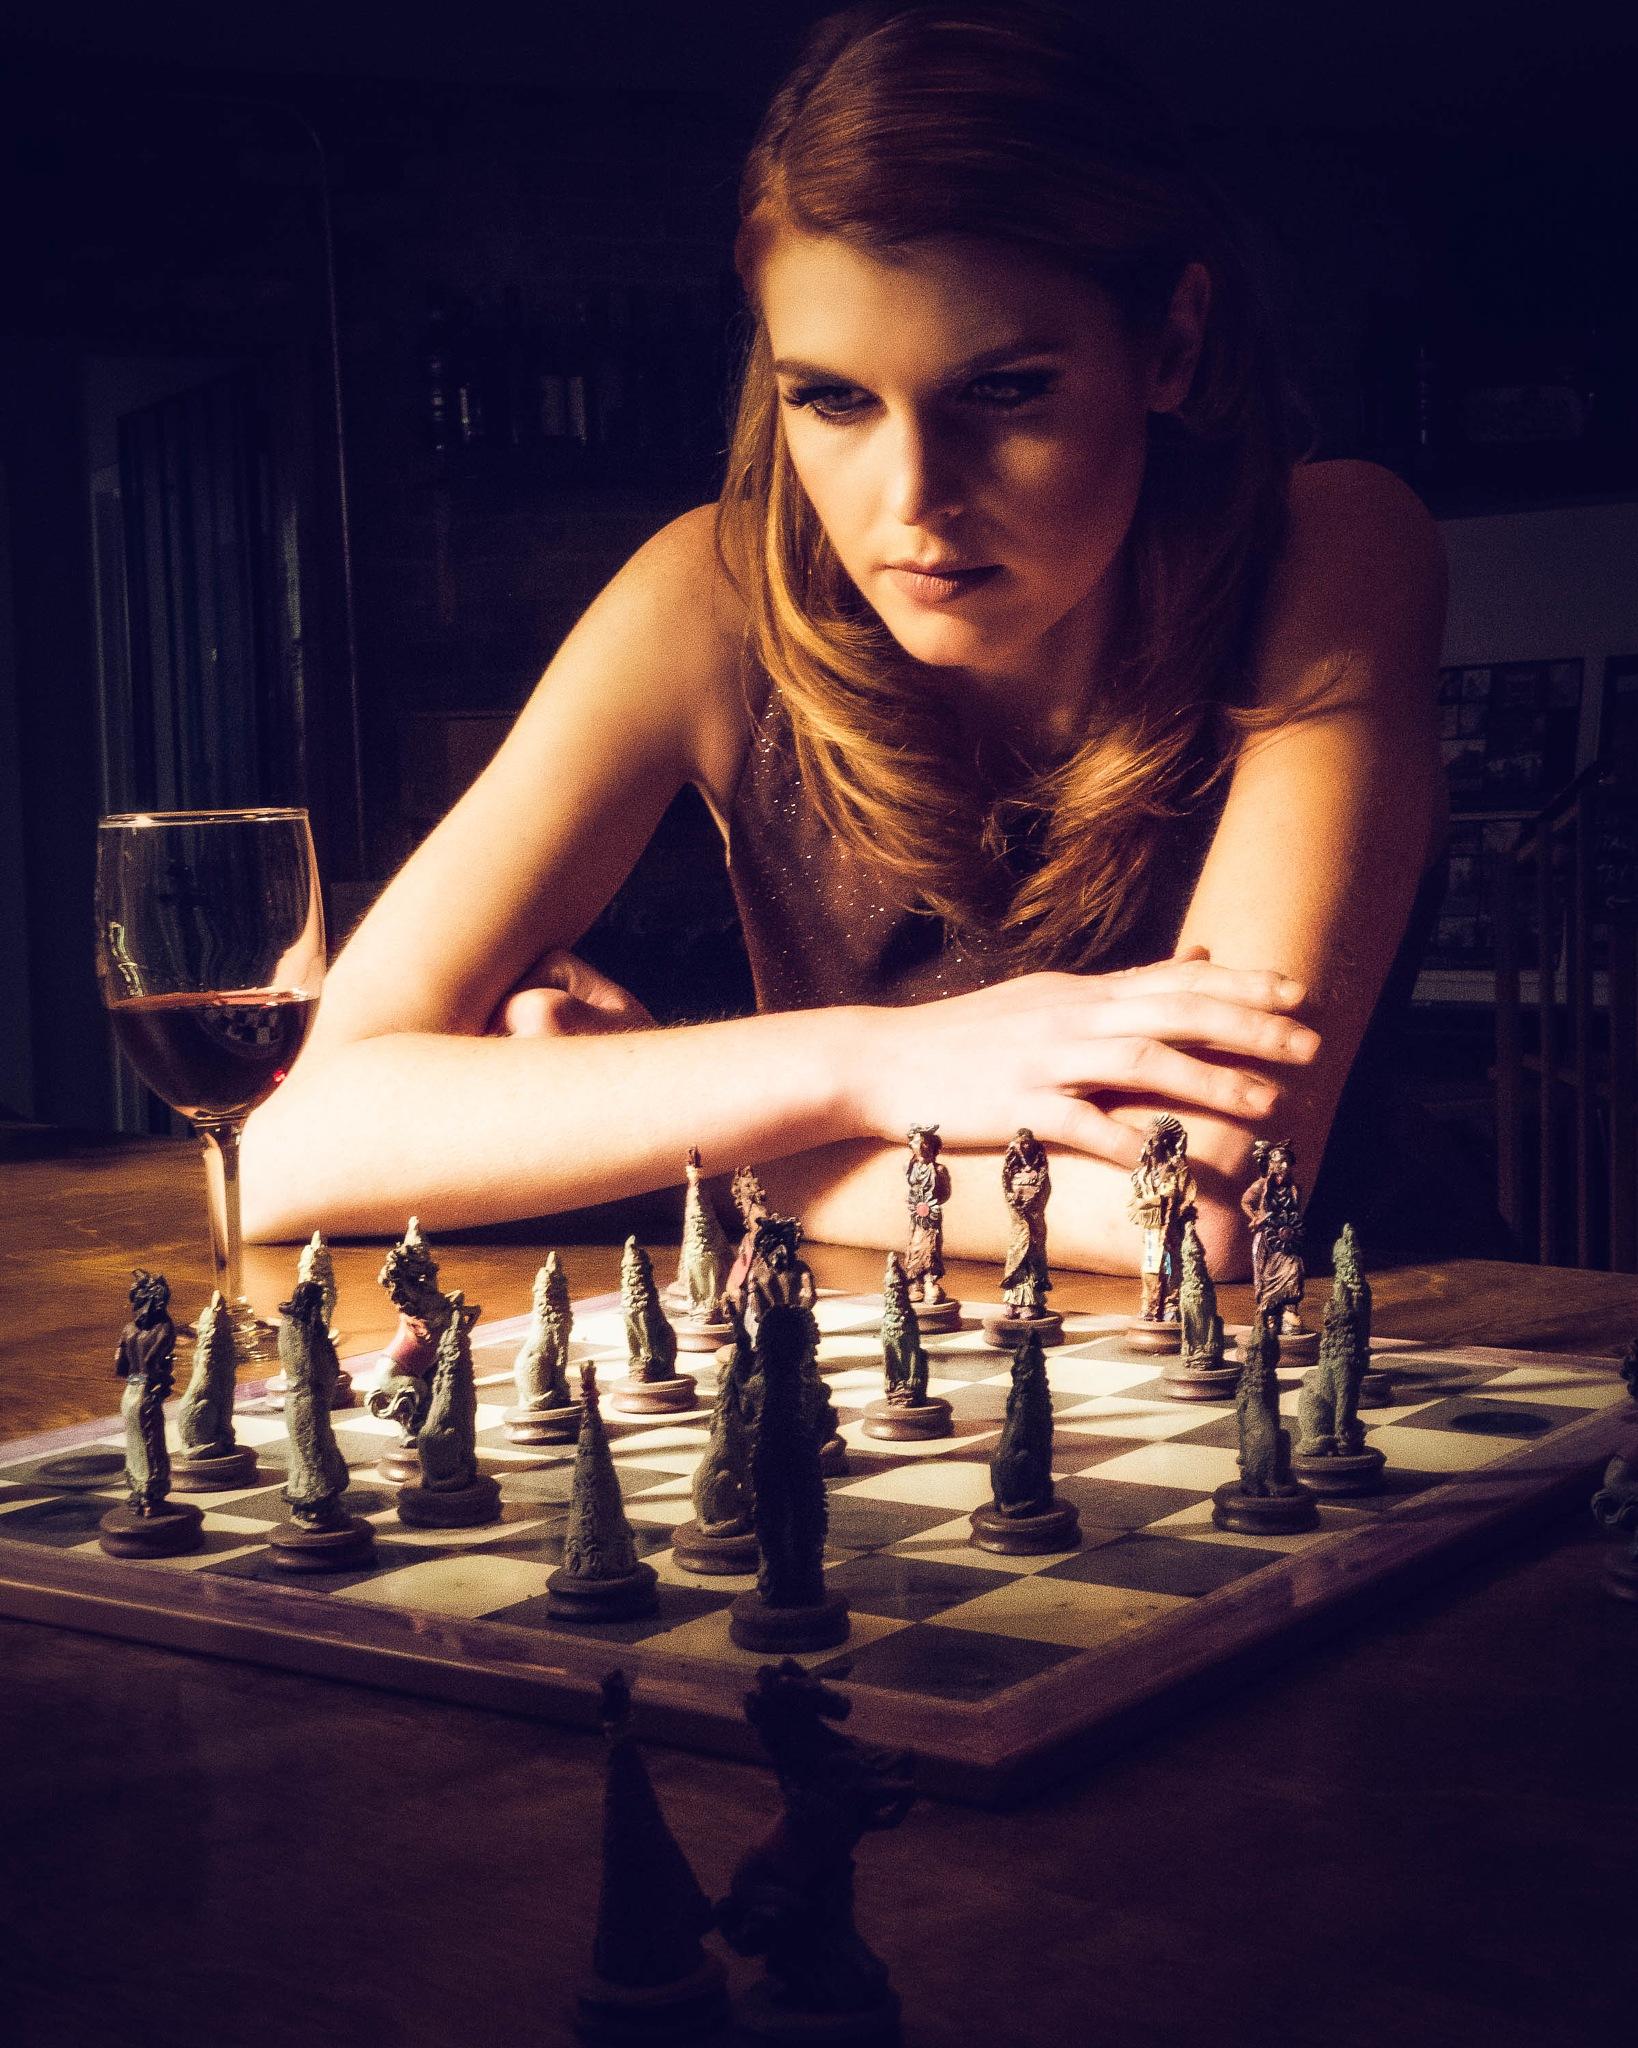 Rachel Playing Chess by Jonathan Frings